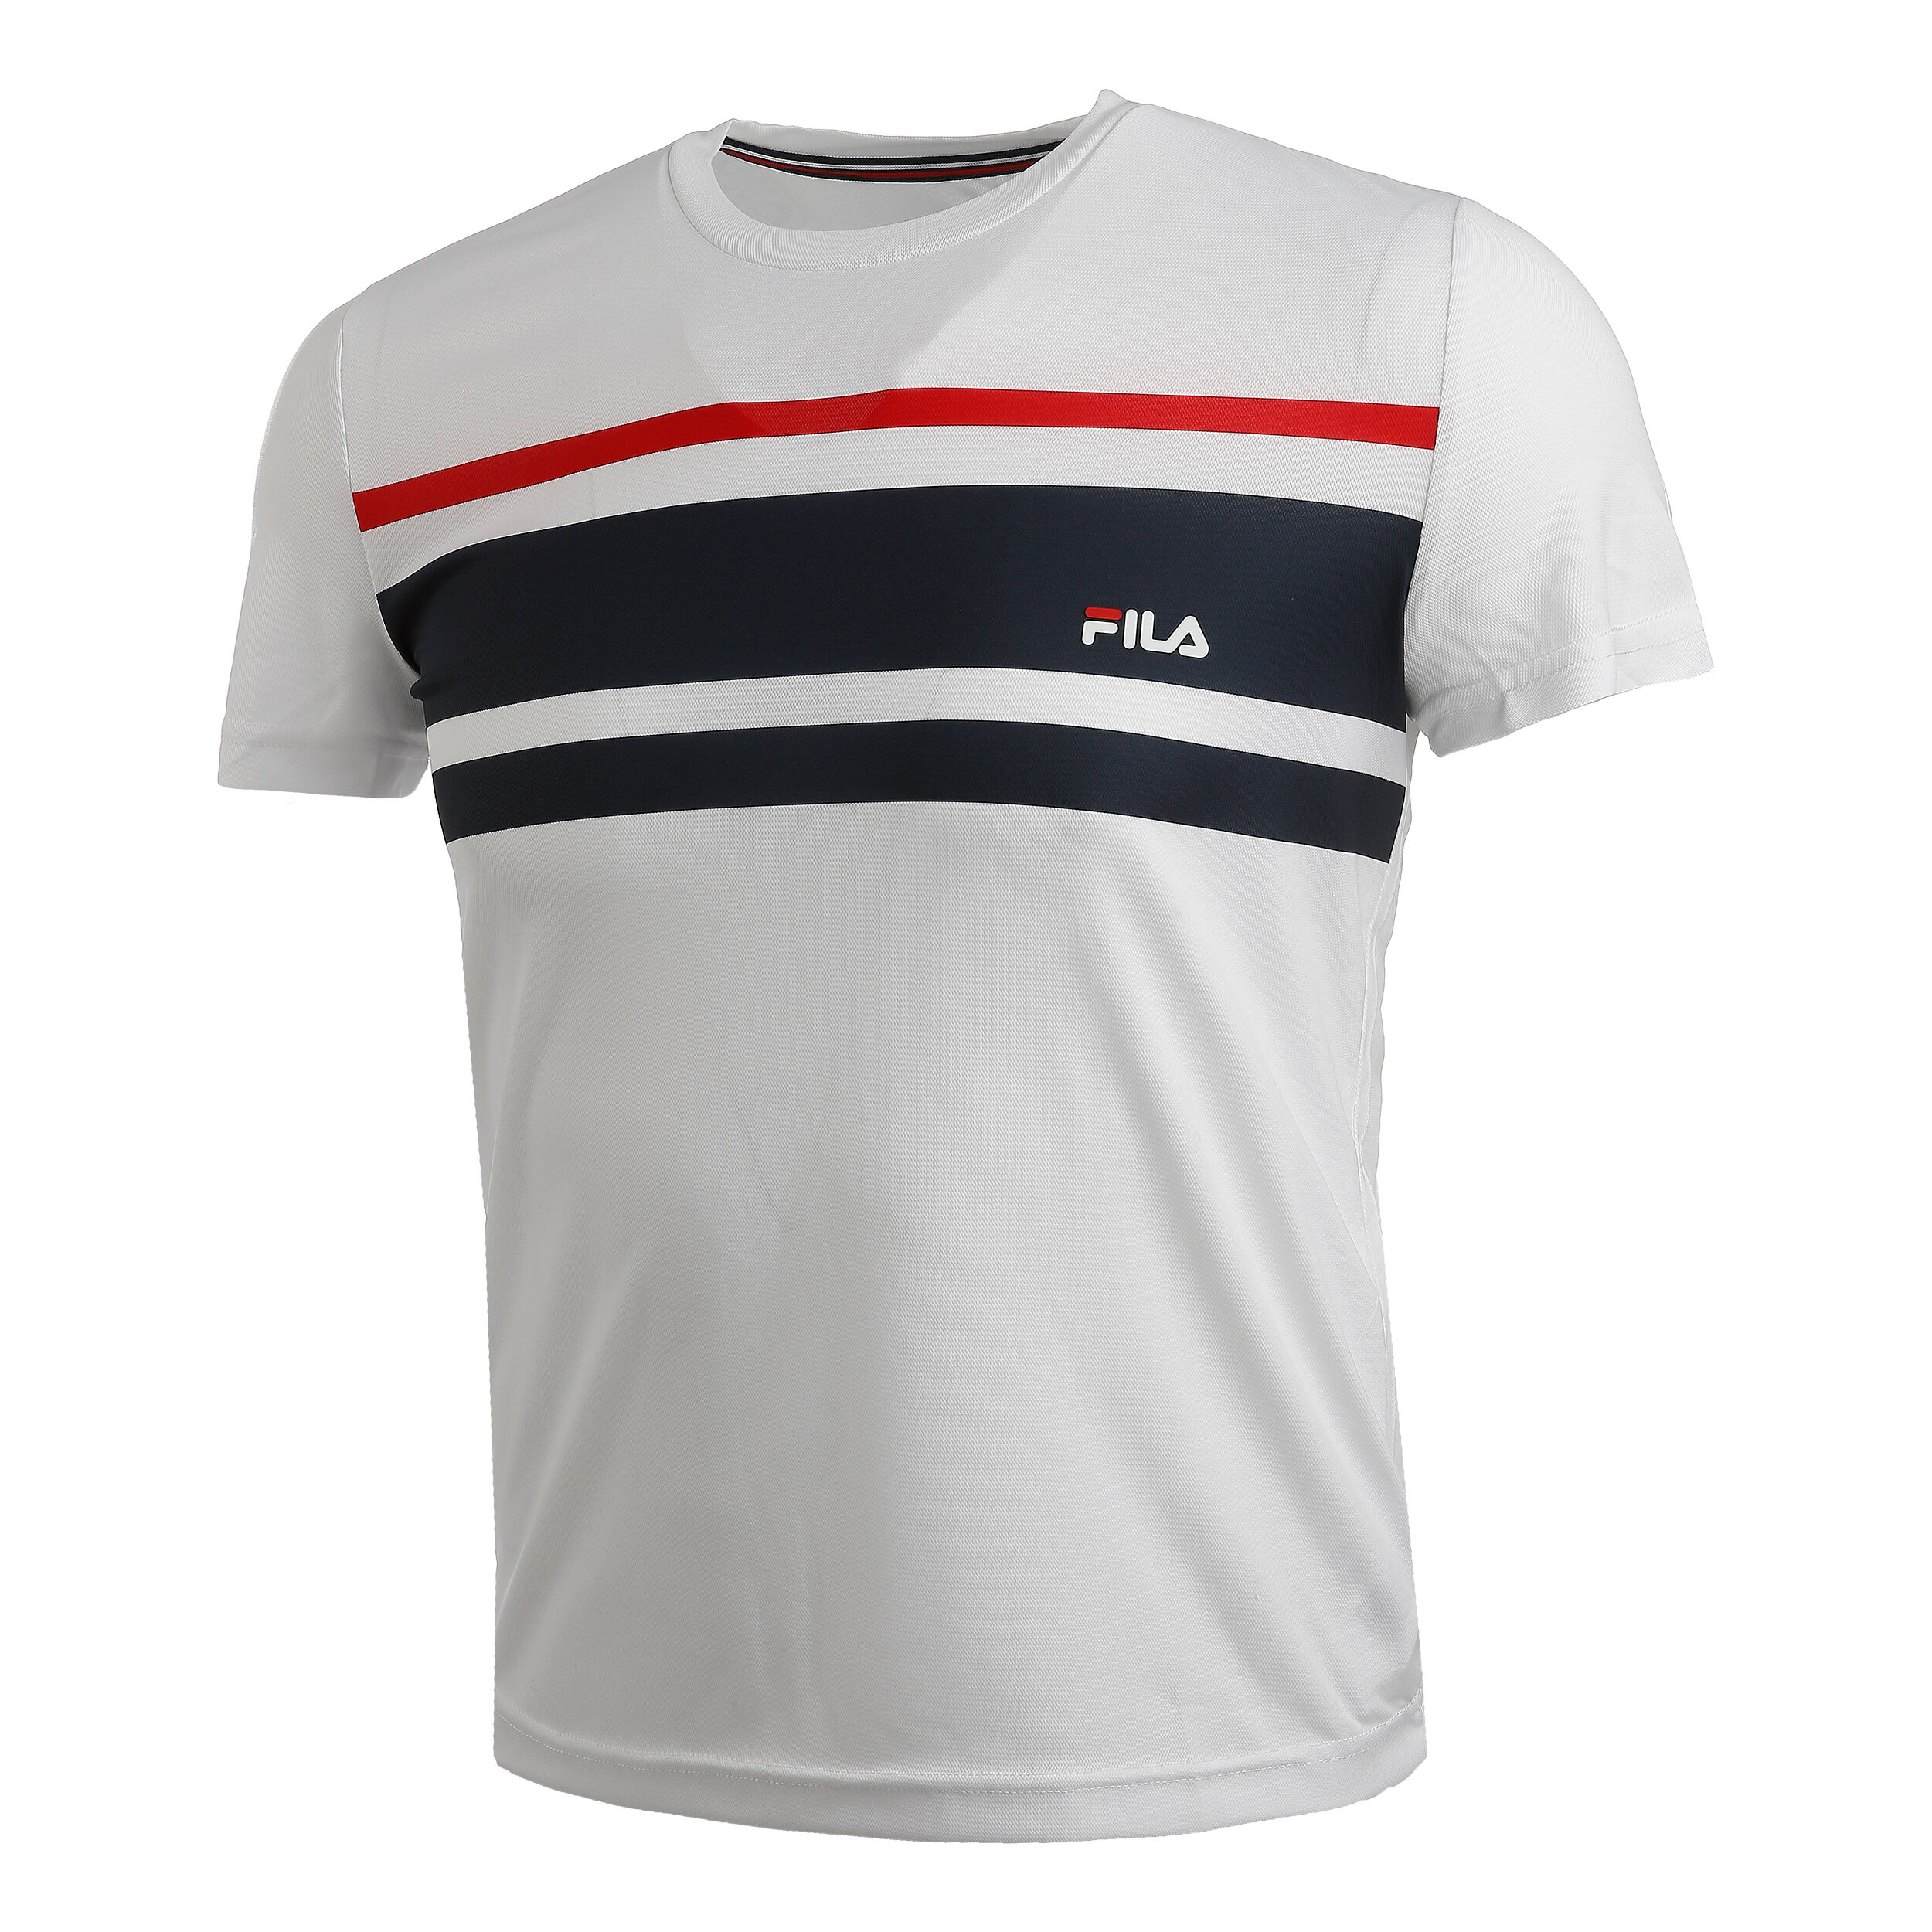 Trey T Shirt Herren Weiß, Dunkelblau